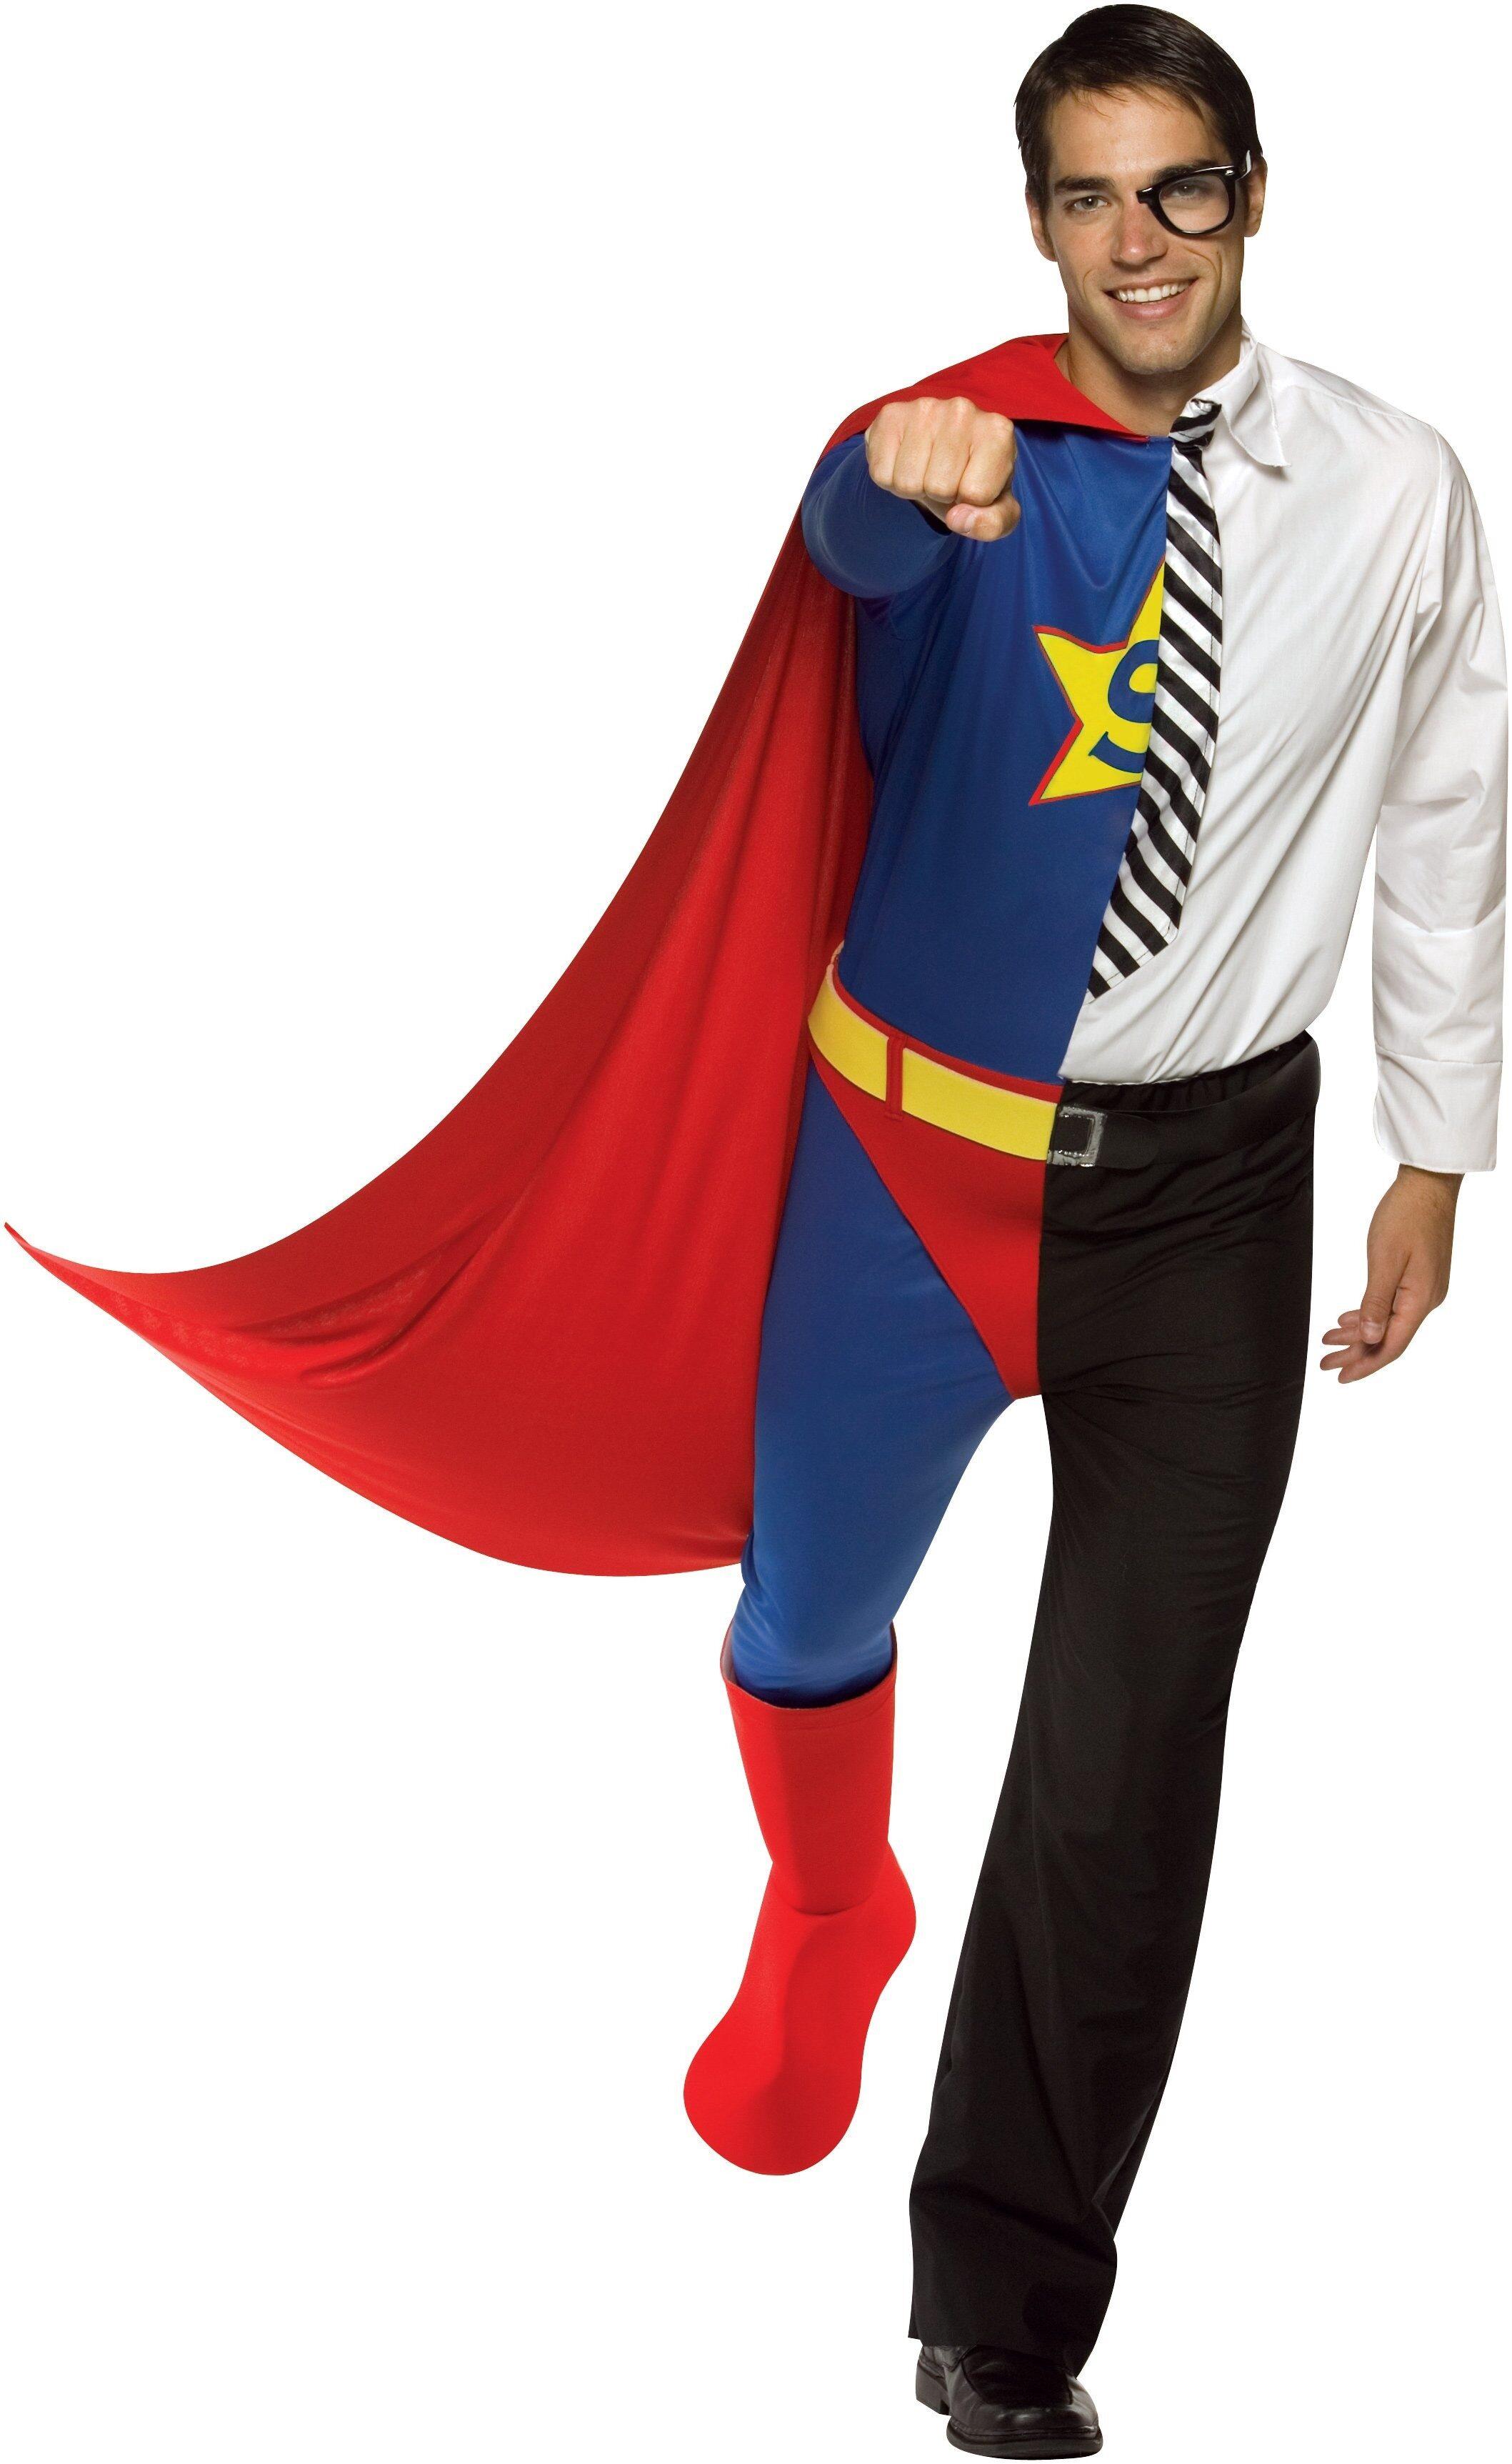 sc 1 st  Mr. Costumes & Dual Superhero and Journalist Adult Costume - Mr. Costumes